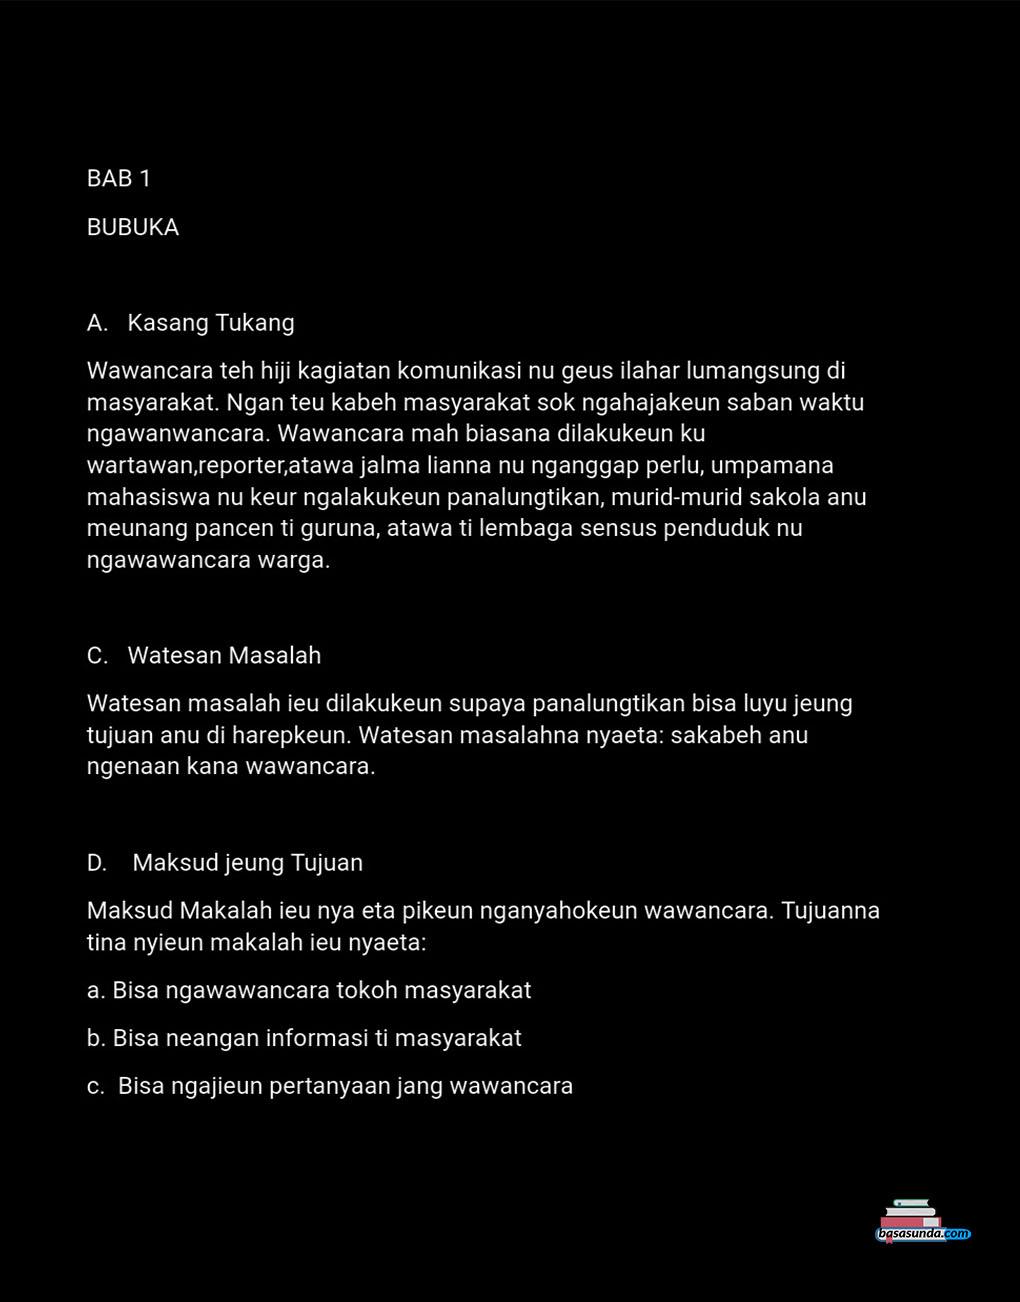 Contoh Makalah Wawancara Pedagang Bahasa Sunda Download Contoh Lengkap Gratis